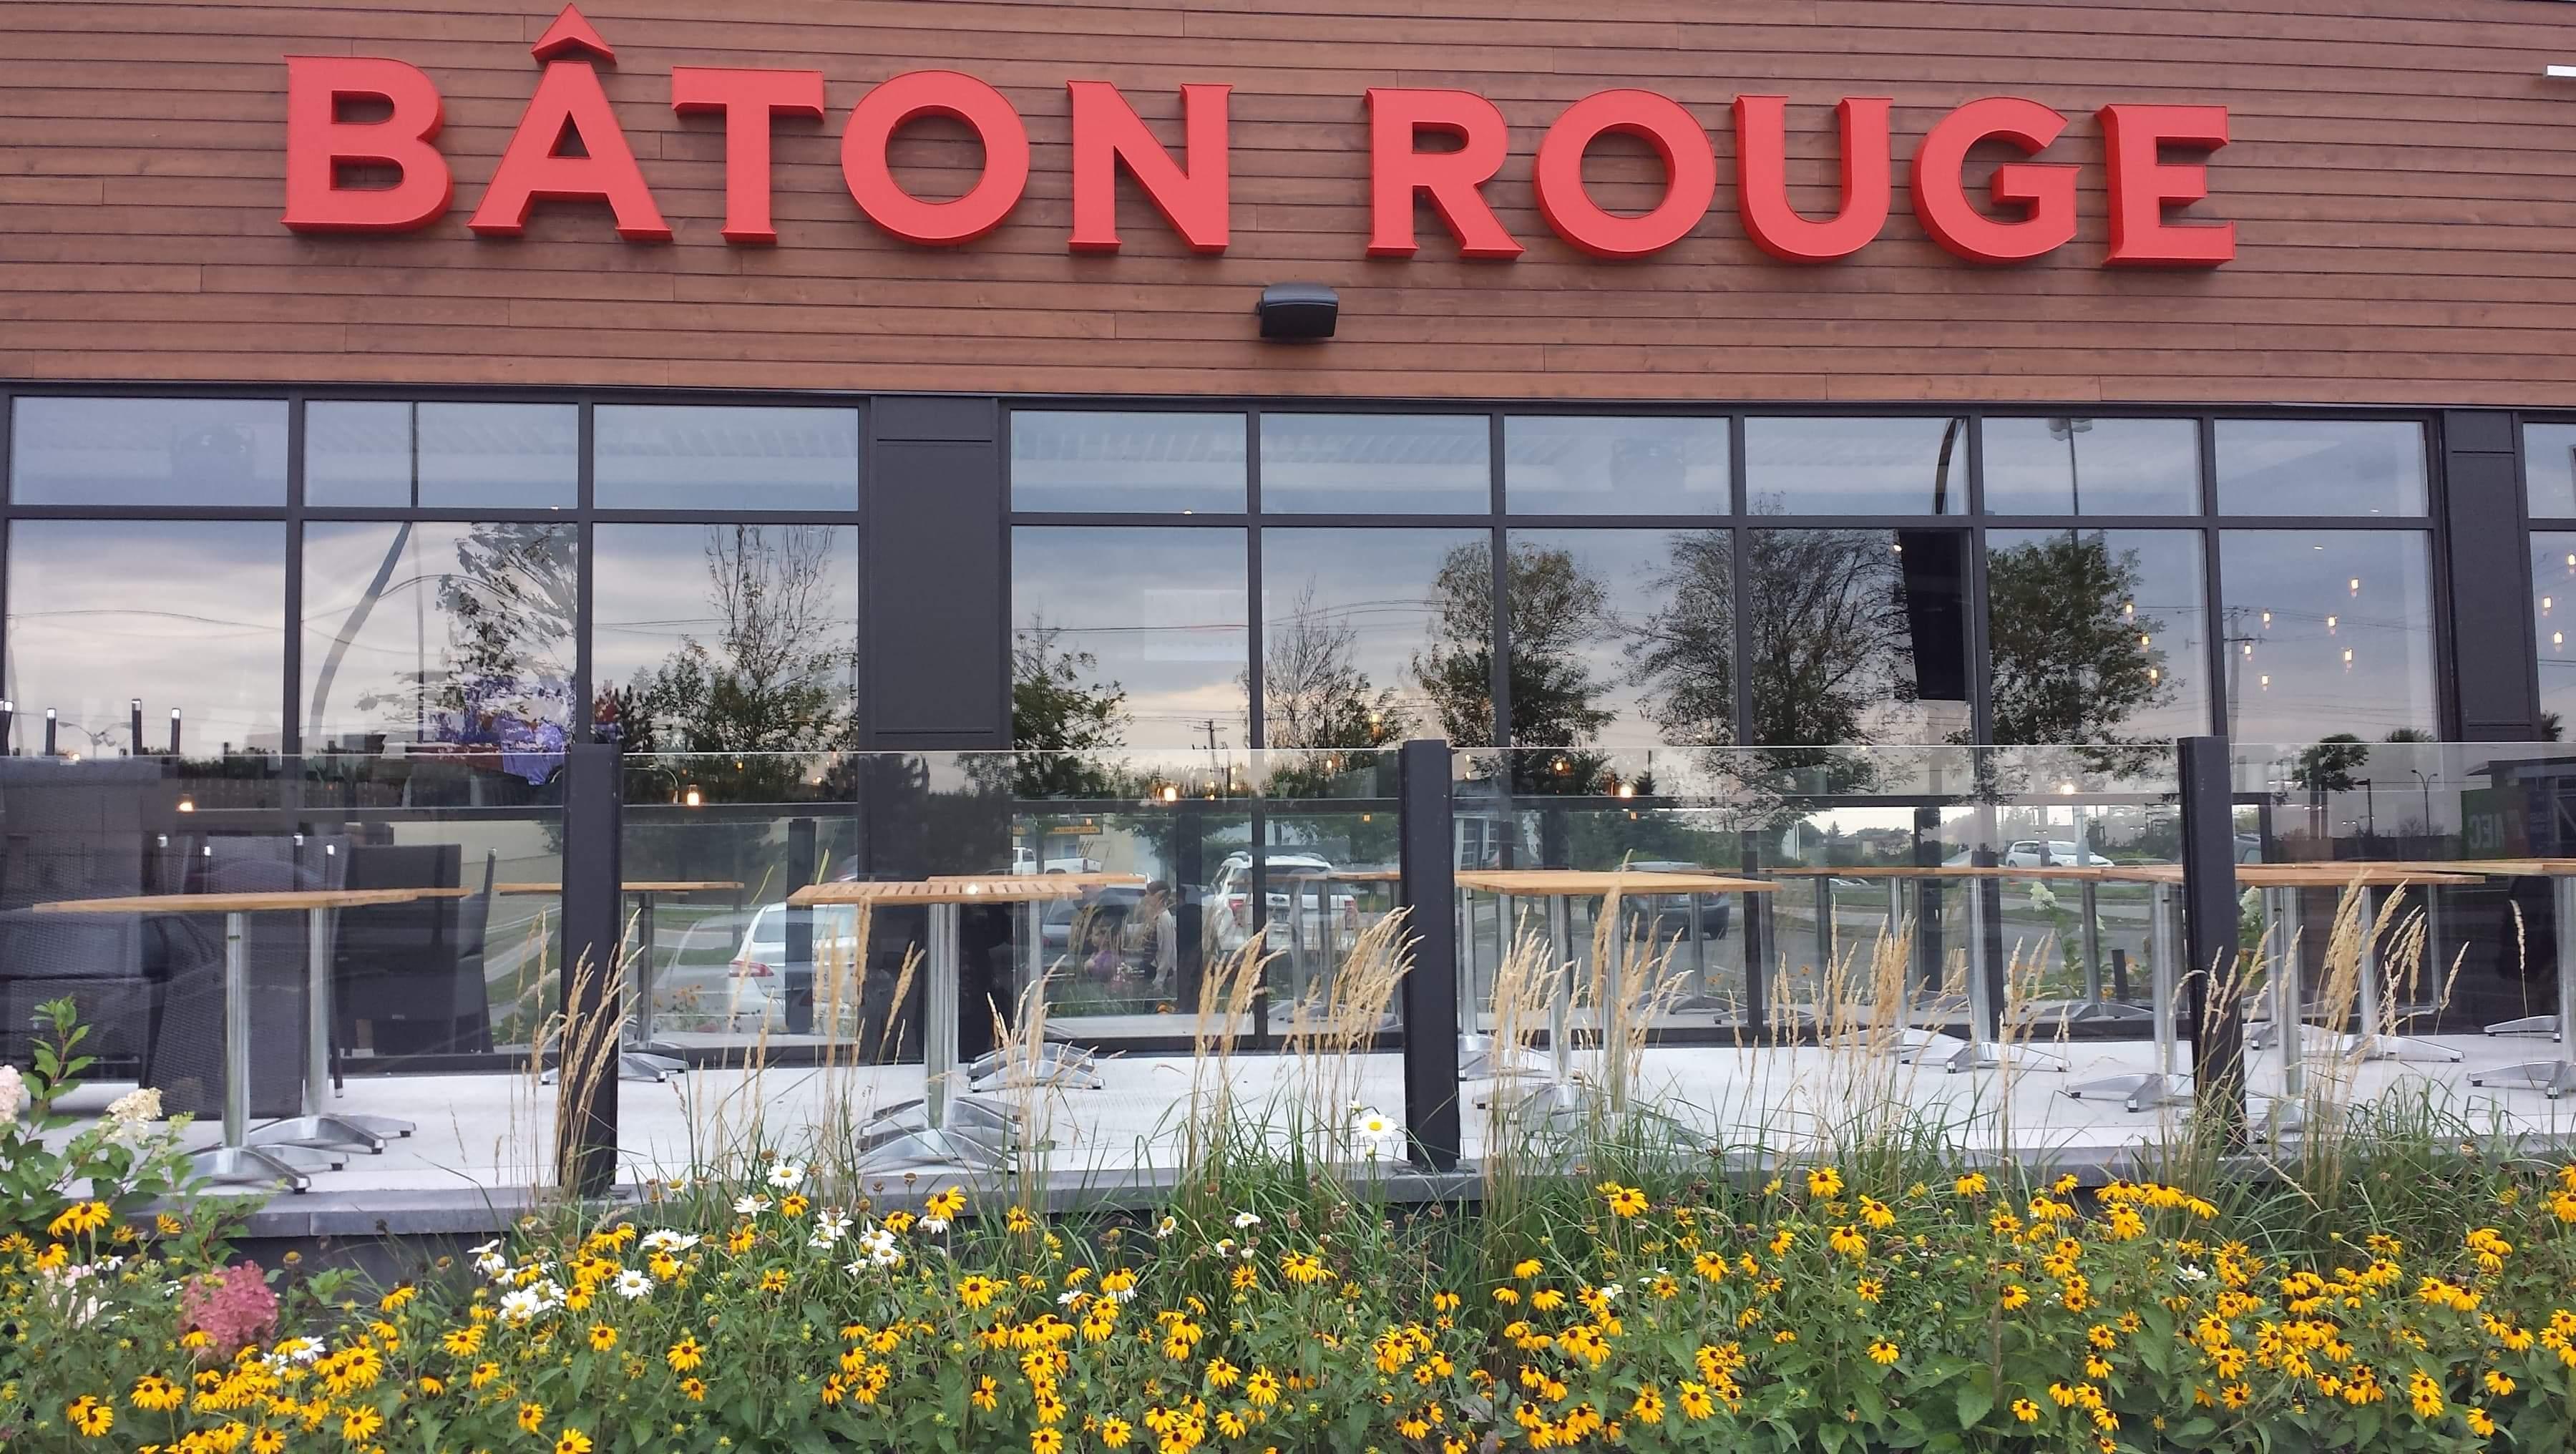 Baton Rouge critique by Charu Satnarine-fnbworld